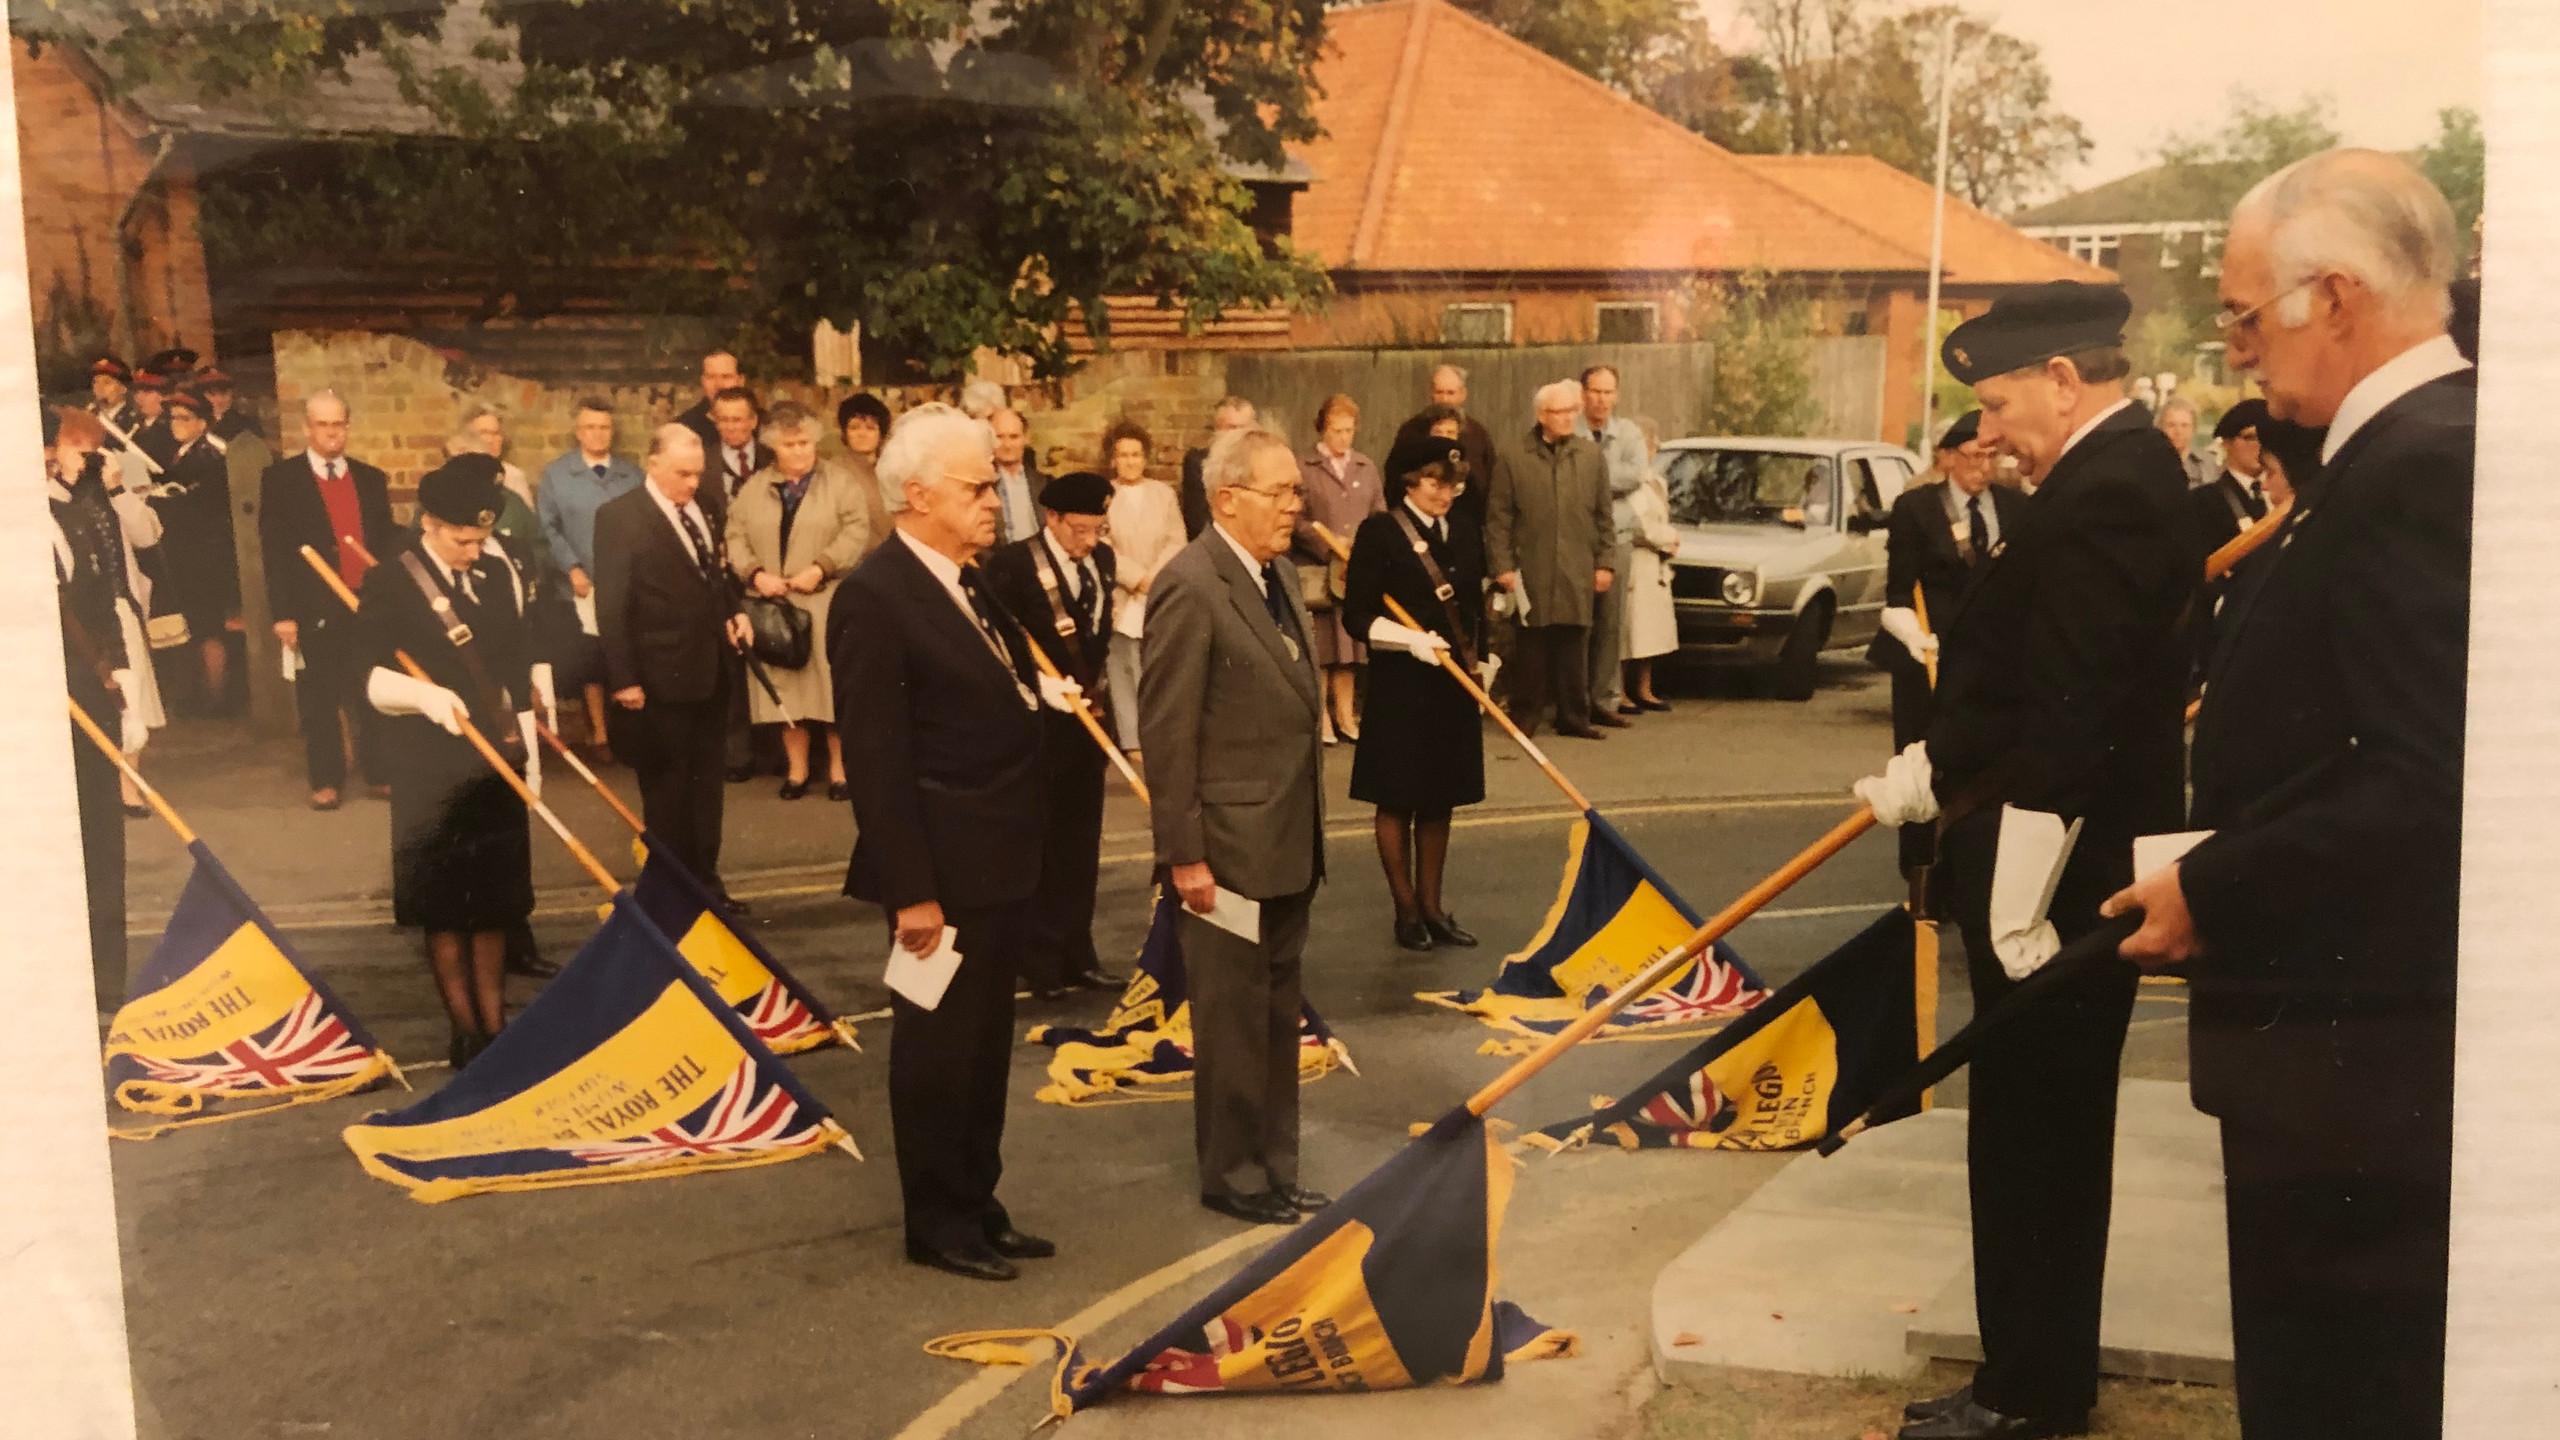 30 years ago in Wickham Market